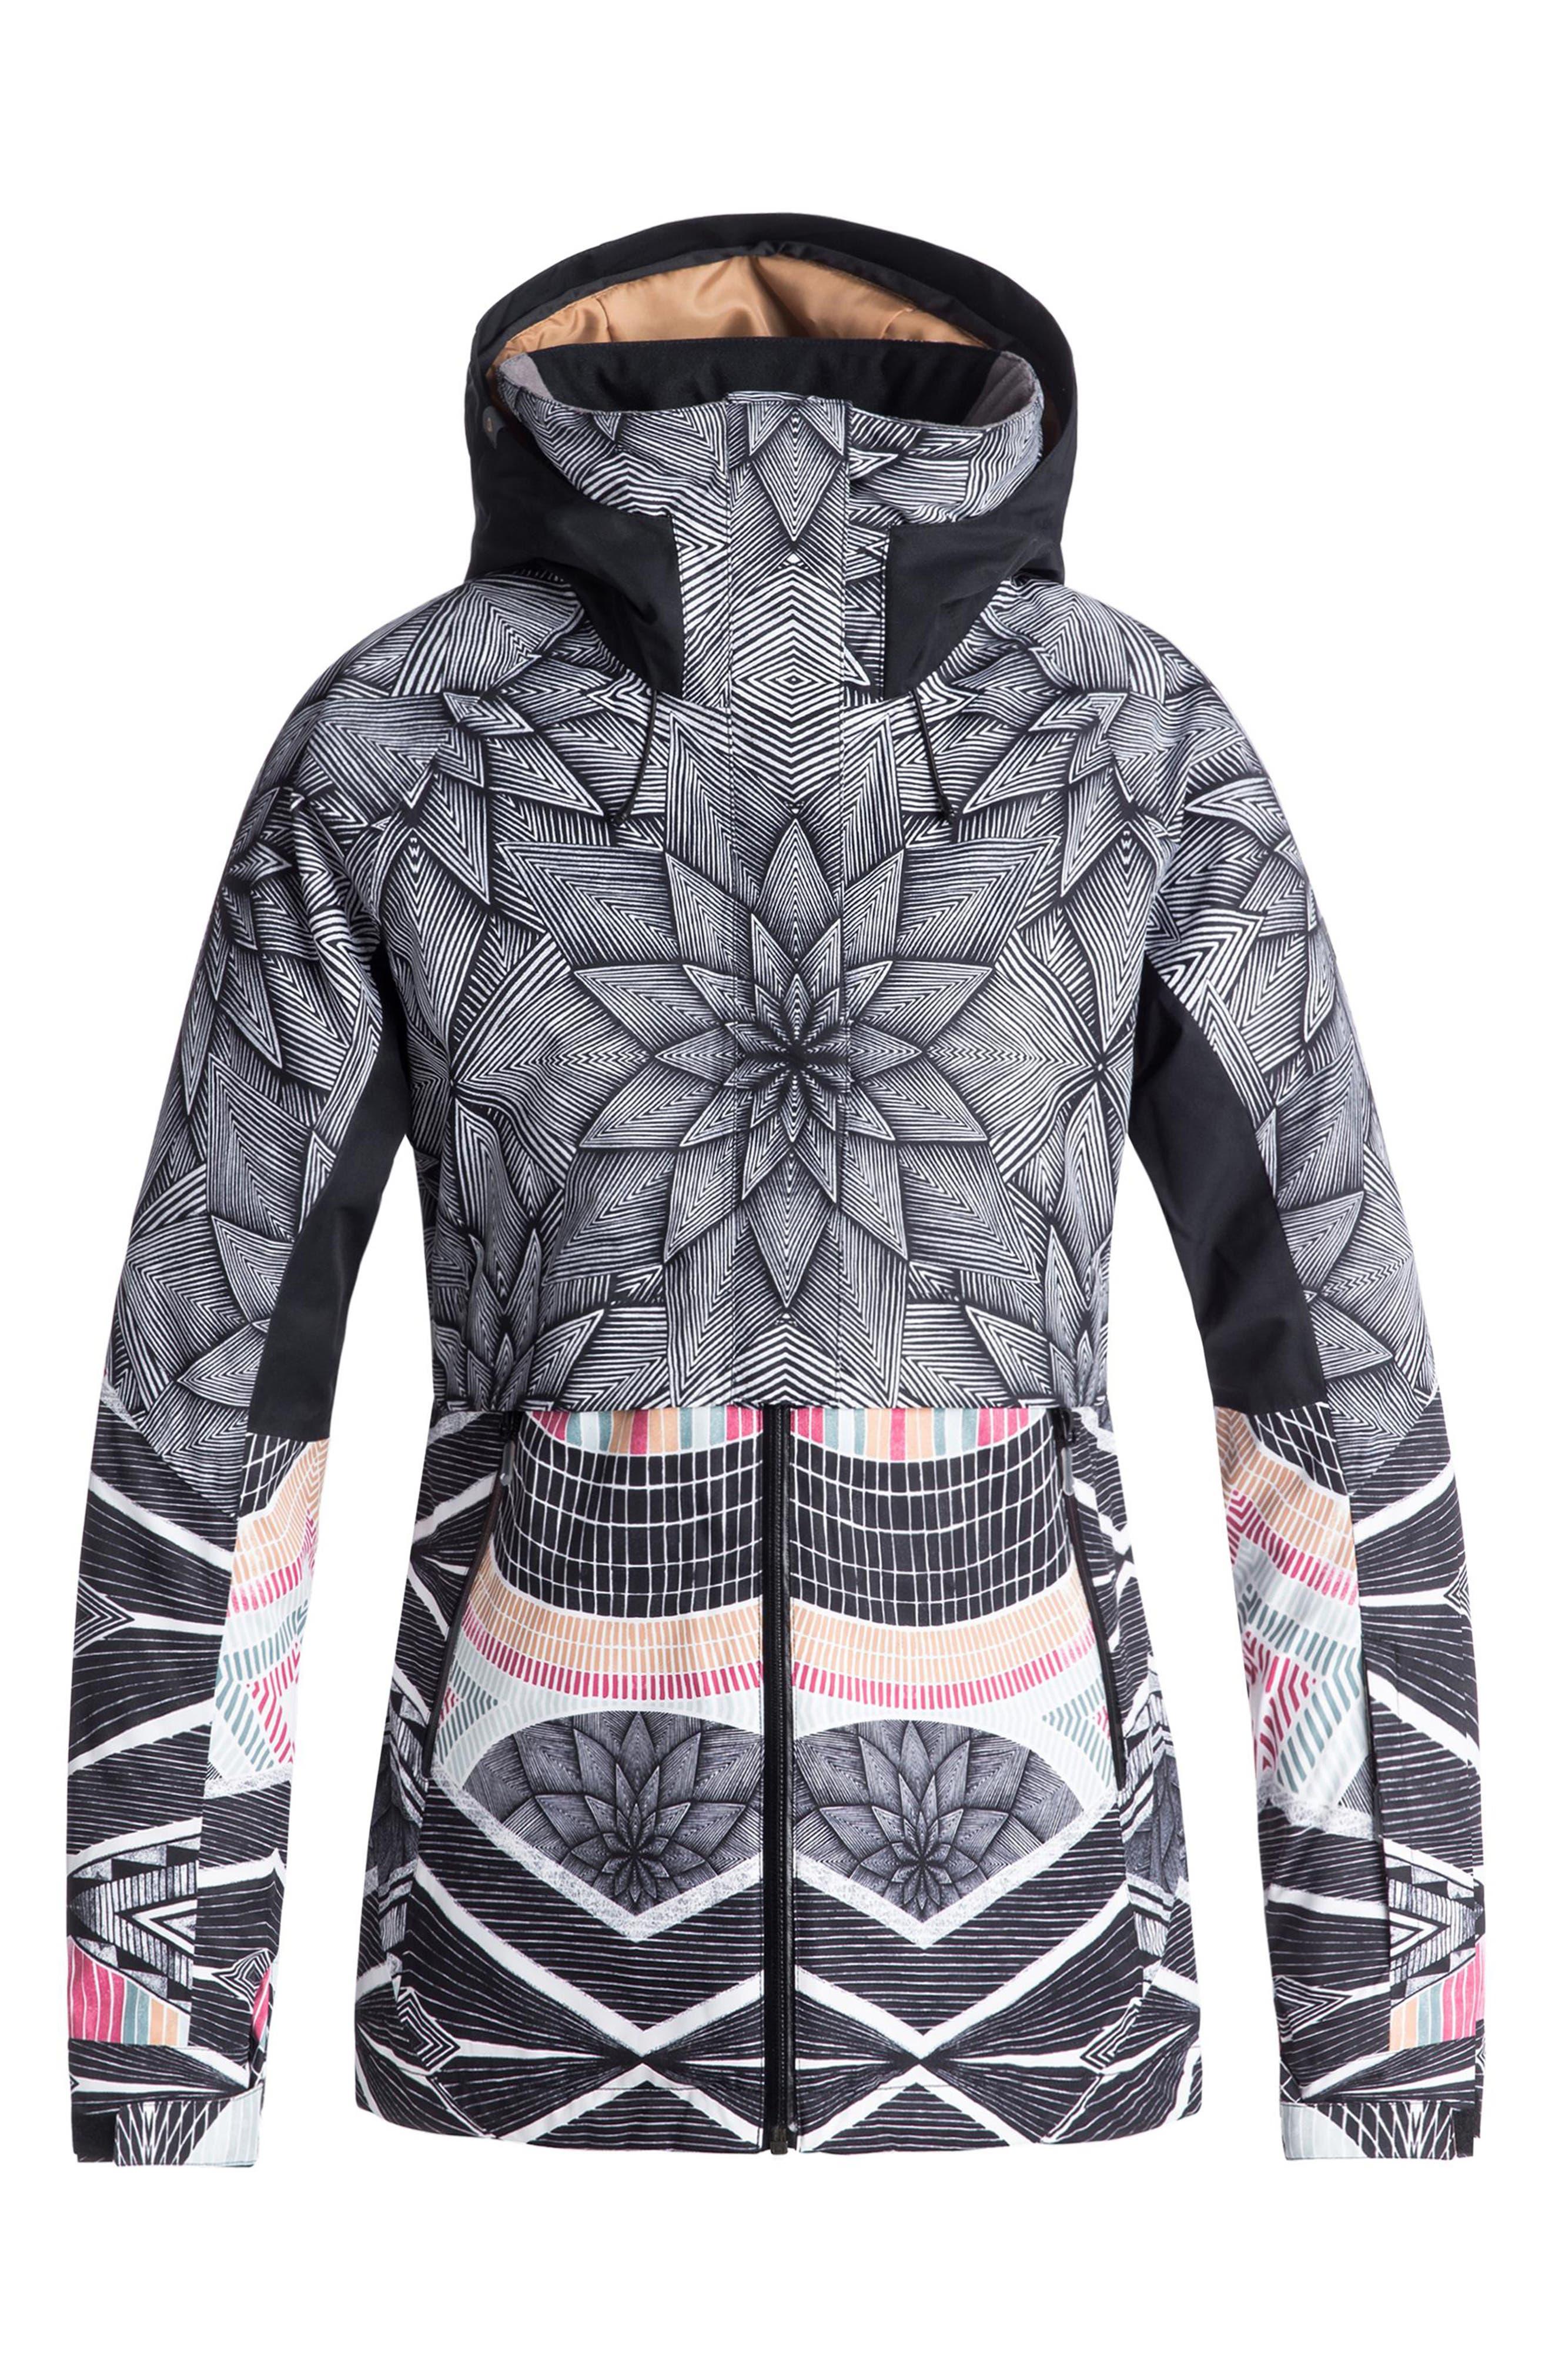 Frozen Flow Hooded Ski Jacket,                         Main,                         color, TRUE BLACK/ POP SNOW STARS